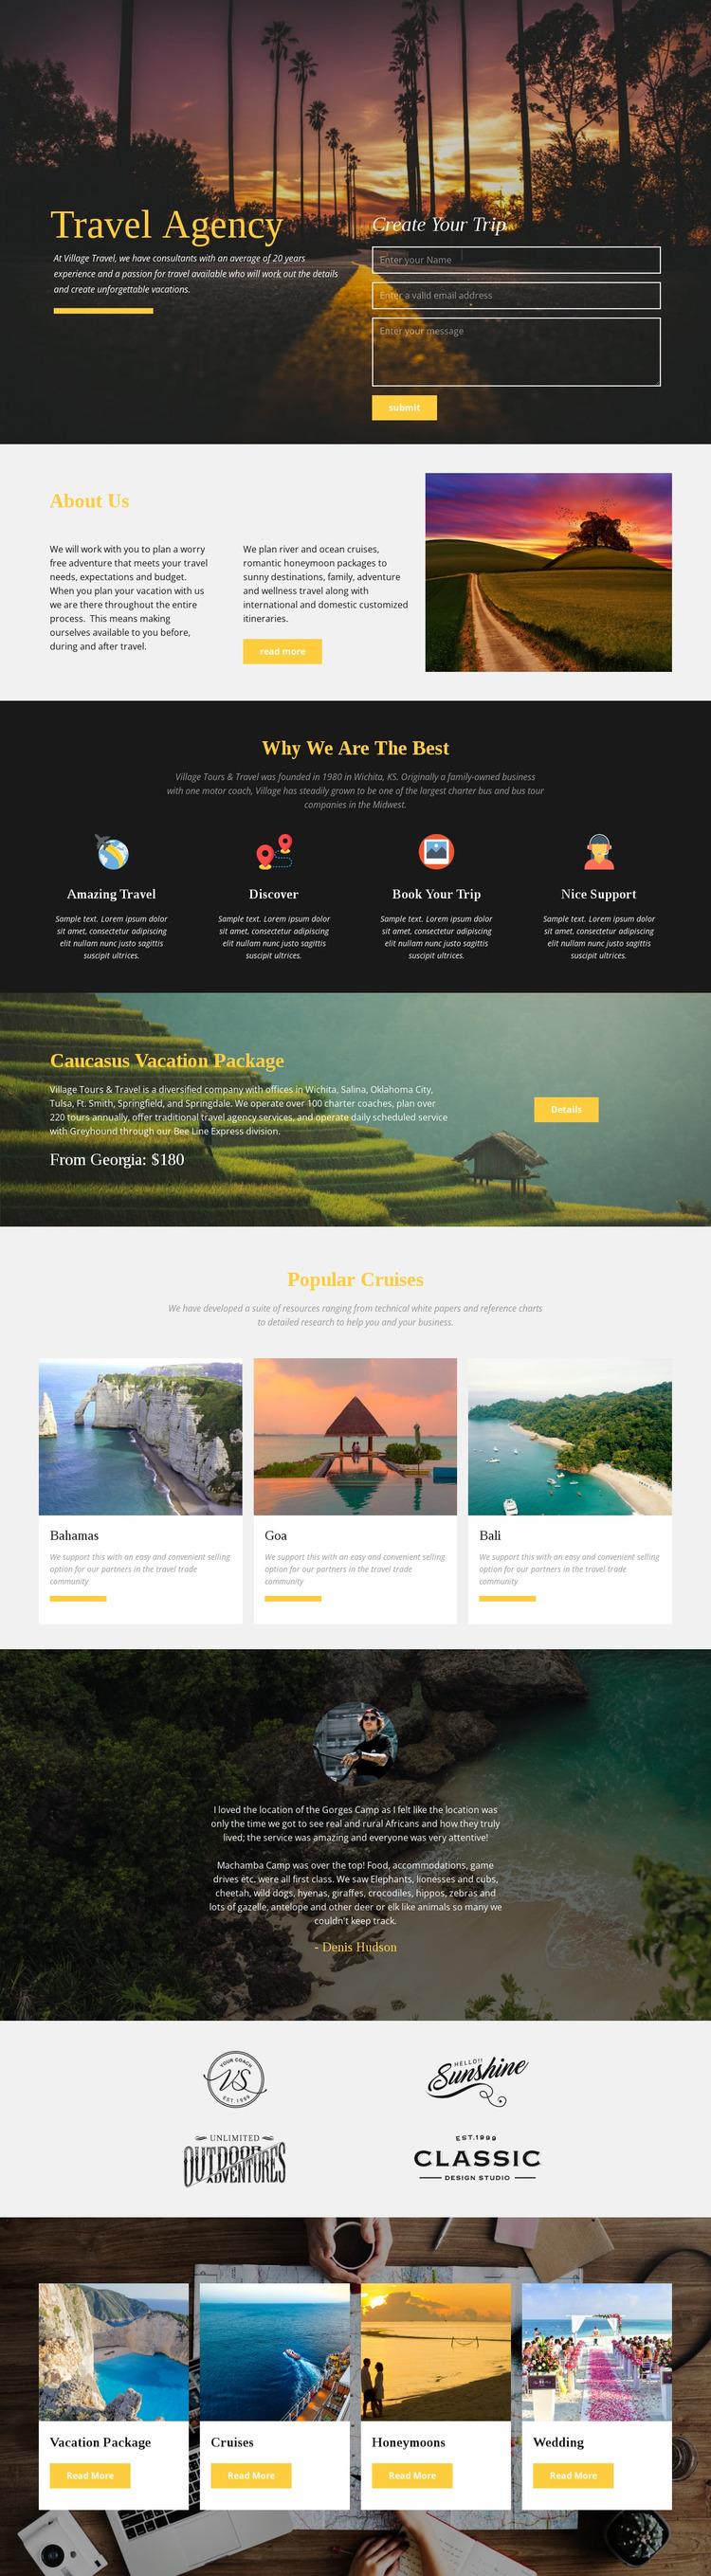 African safari tour company Website Mockup